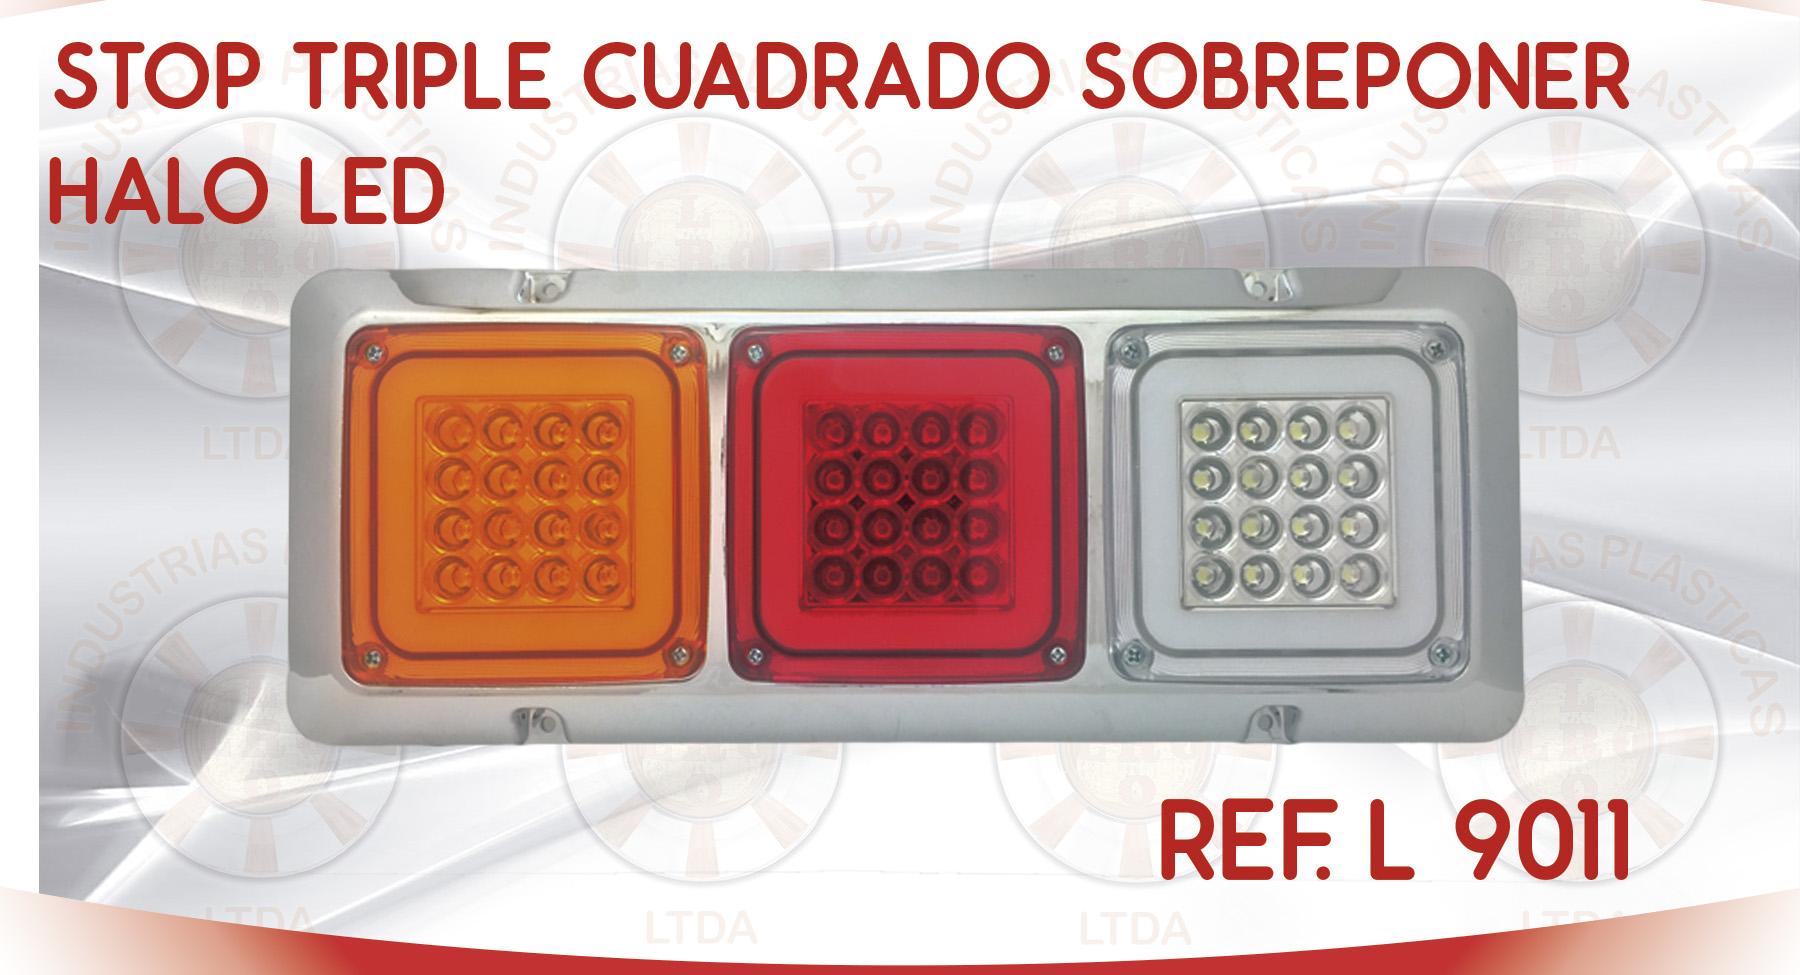 L 9011 STOP TRIPLE CUADRADO SOBREPONER HALO LED